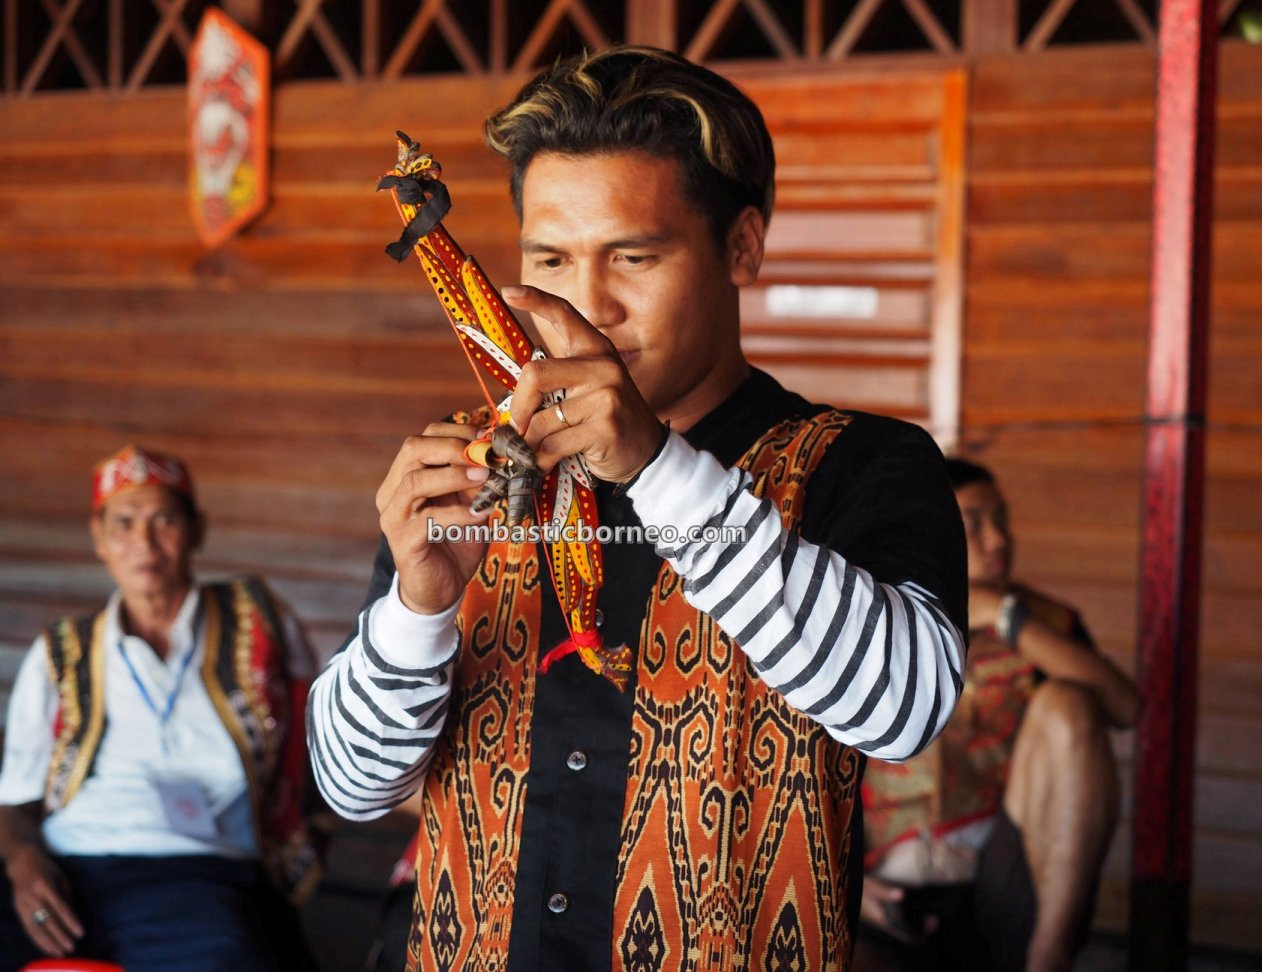 Pasar Flamboyan, river, native market, authentic, traditional, destination, Gawai Dayak, Borneo, Obyek wisata, Tourism, tourist attraction, travel guide, Cross Border, 印尼西加里曼丹, 塞卡道旅游景点,